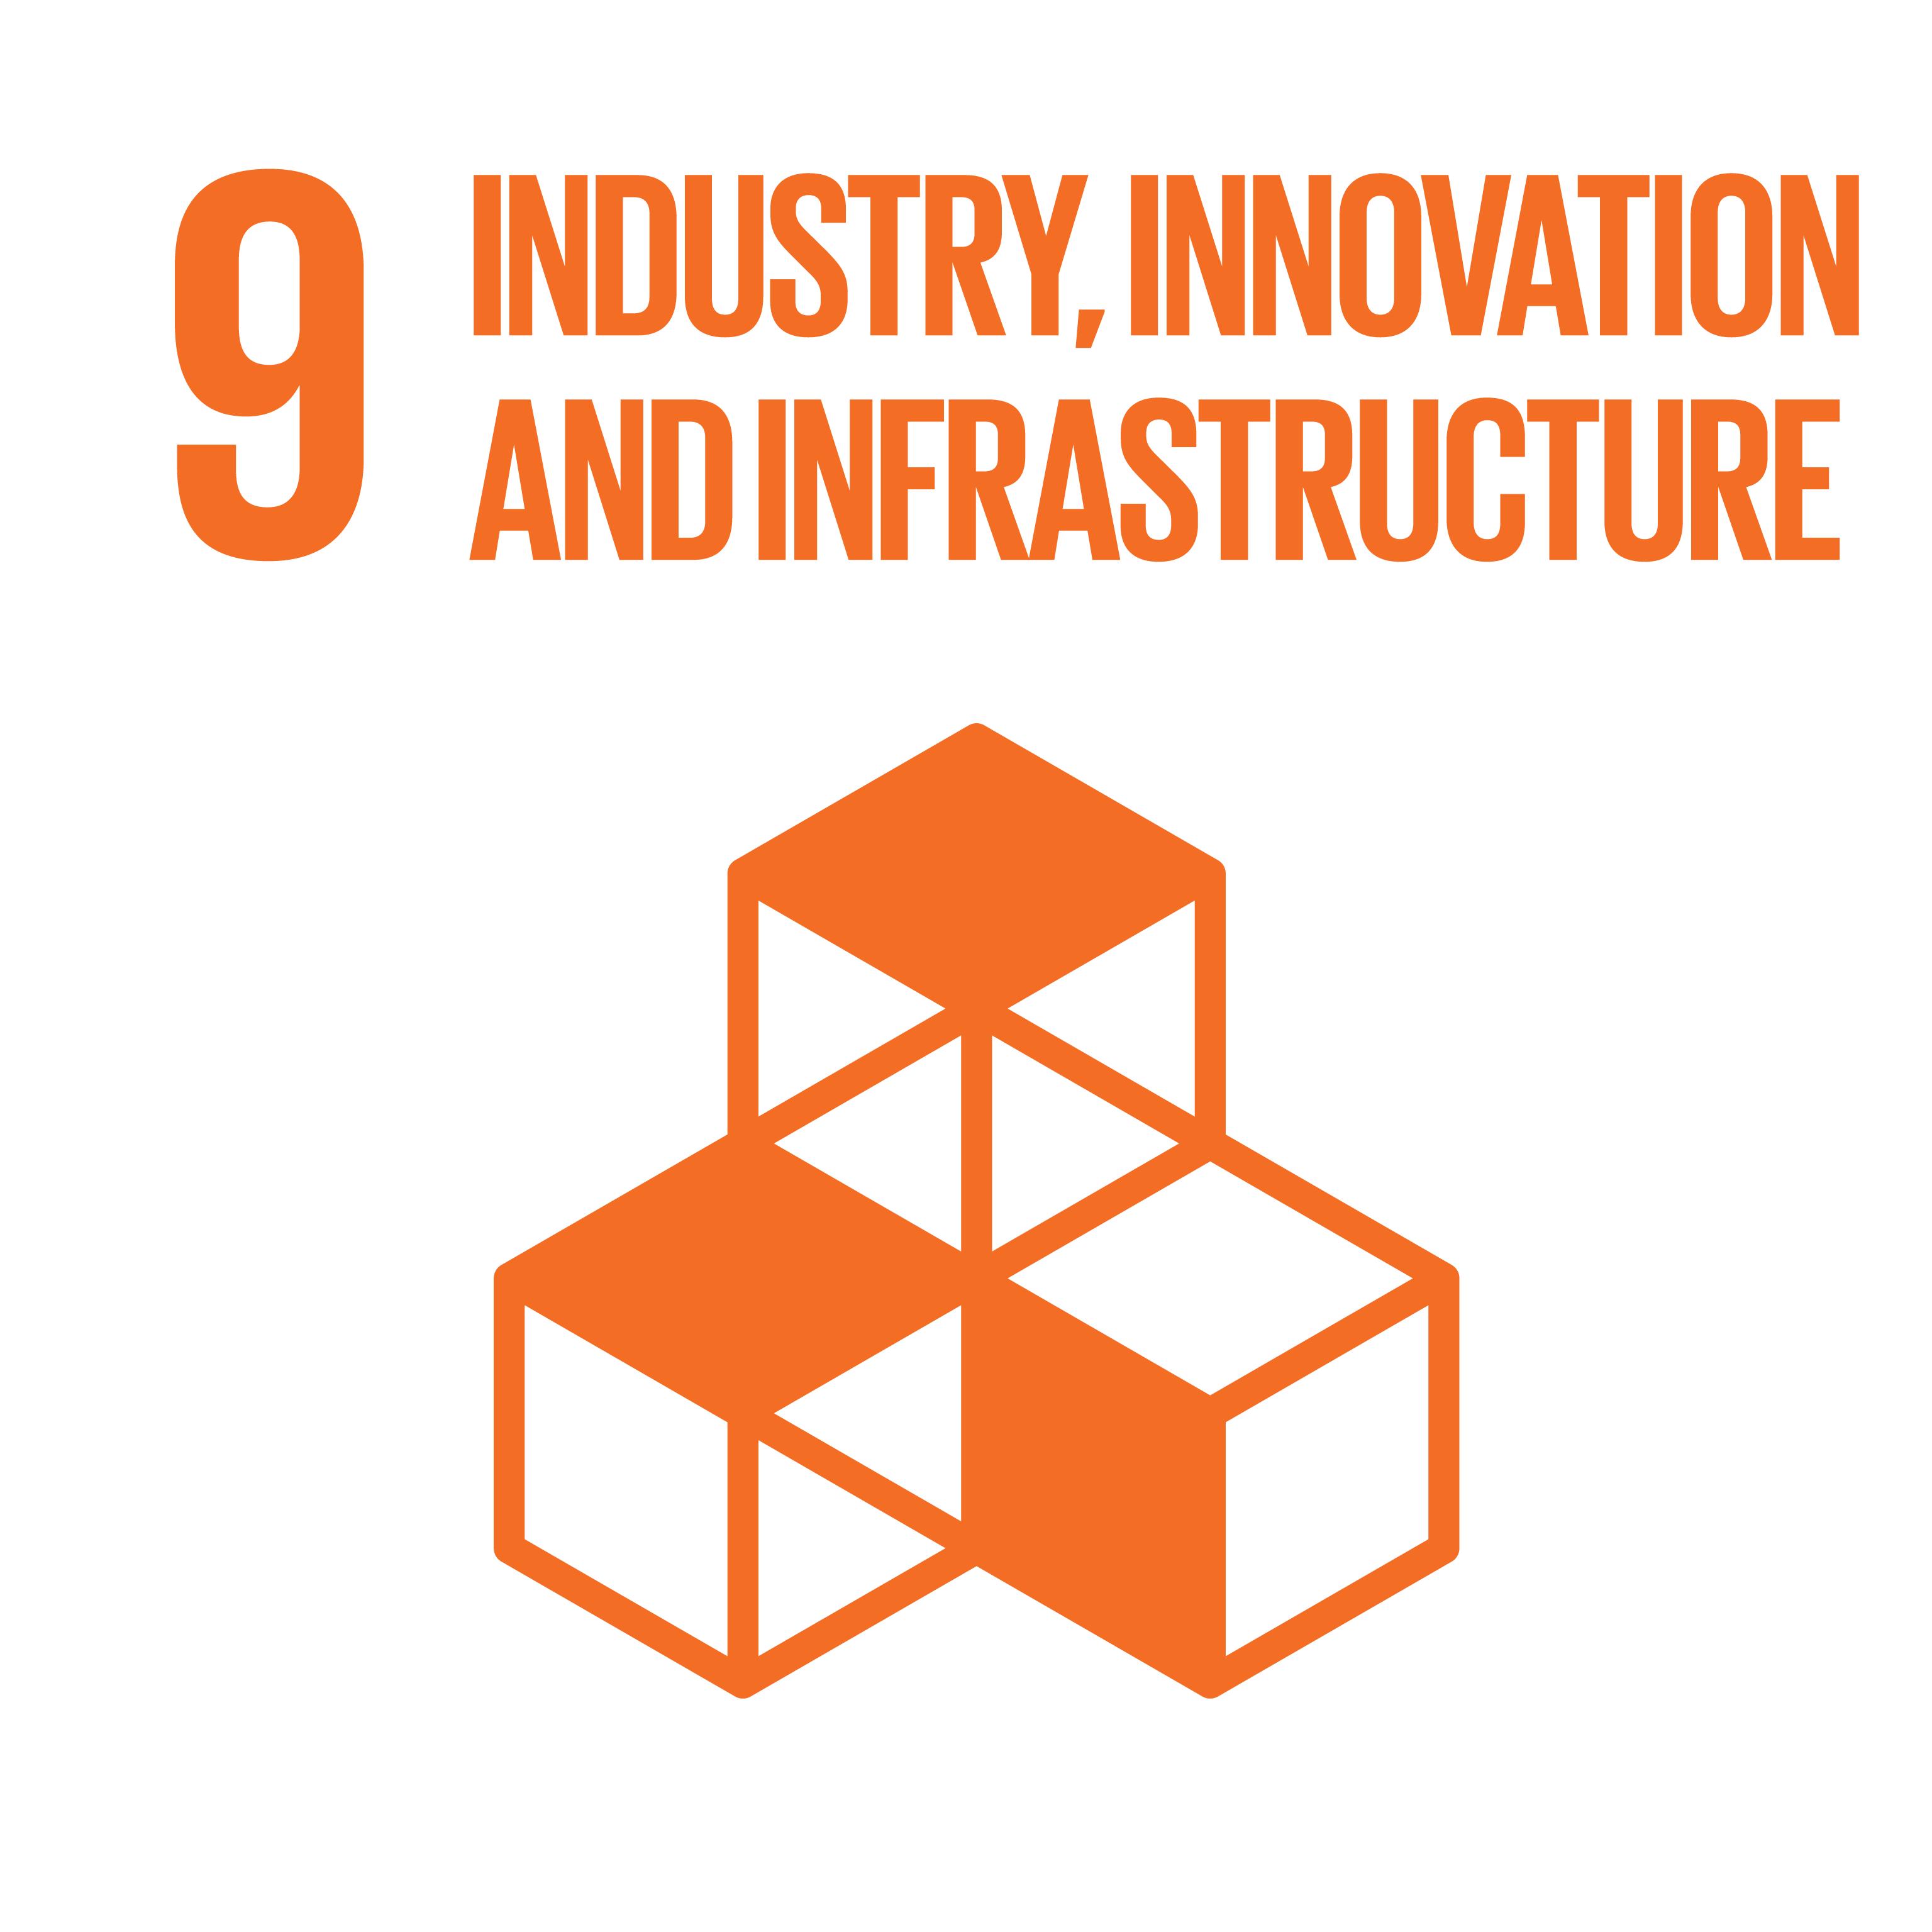 Sustainable Development Goals 09 industry innovation infrastructure